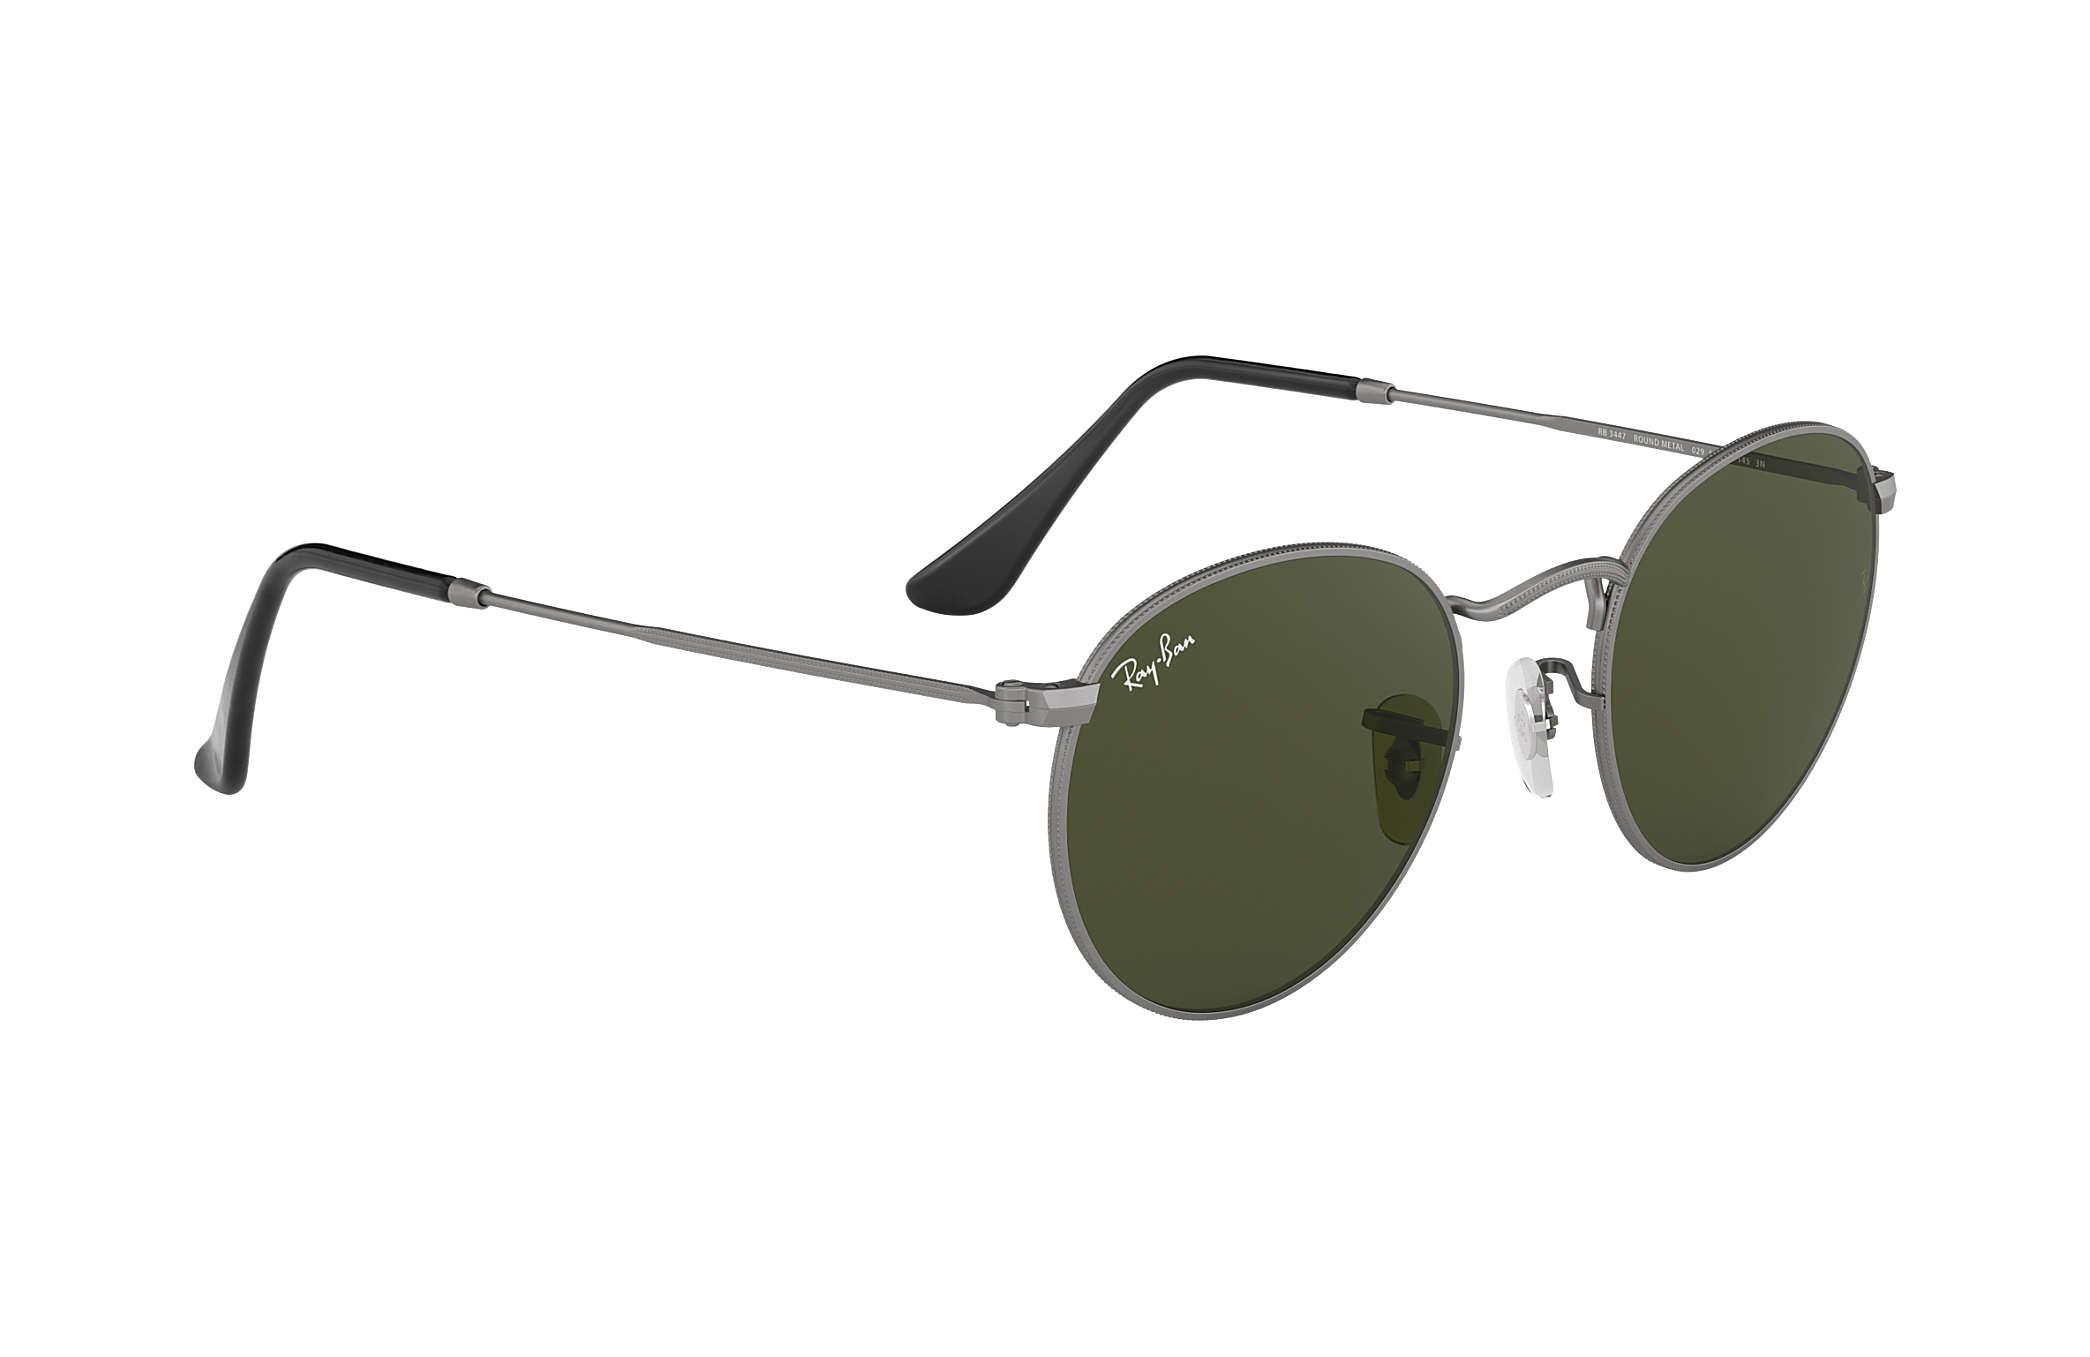 b31600e3a4 Ray-Ban Round Metal RB3447 Gunmetal - Metal - Green Lenses ...